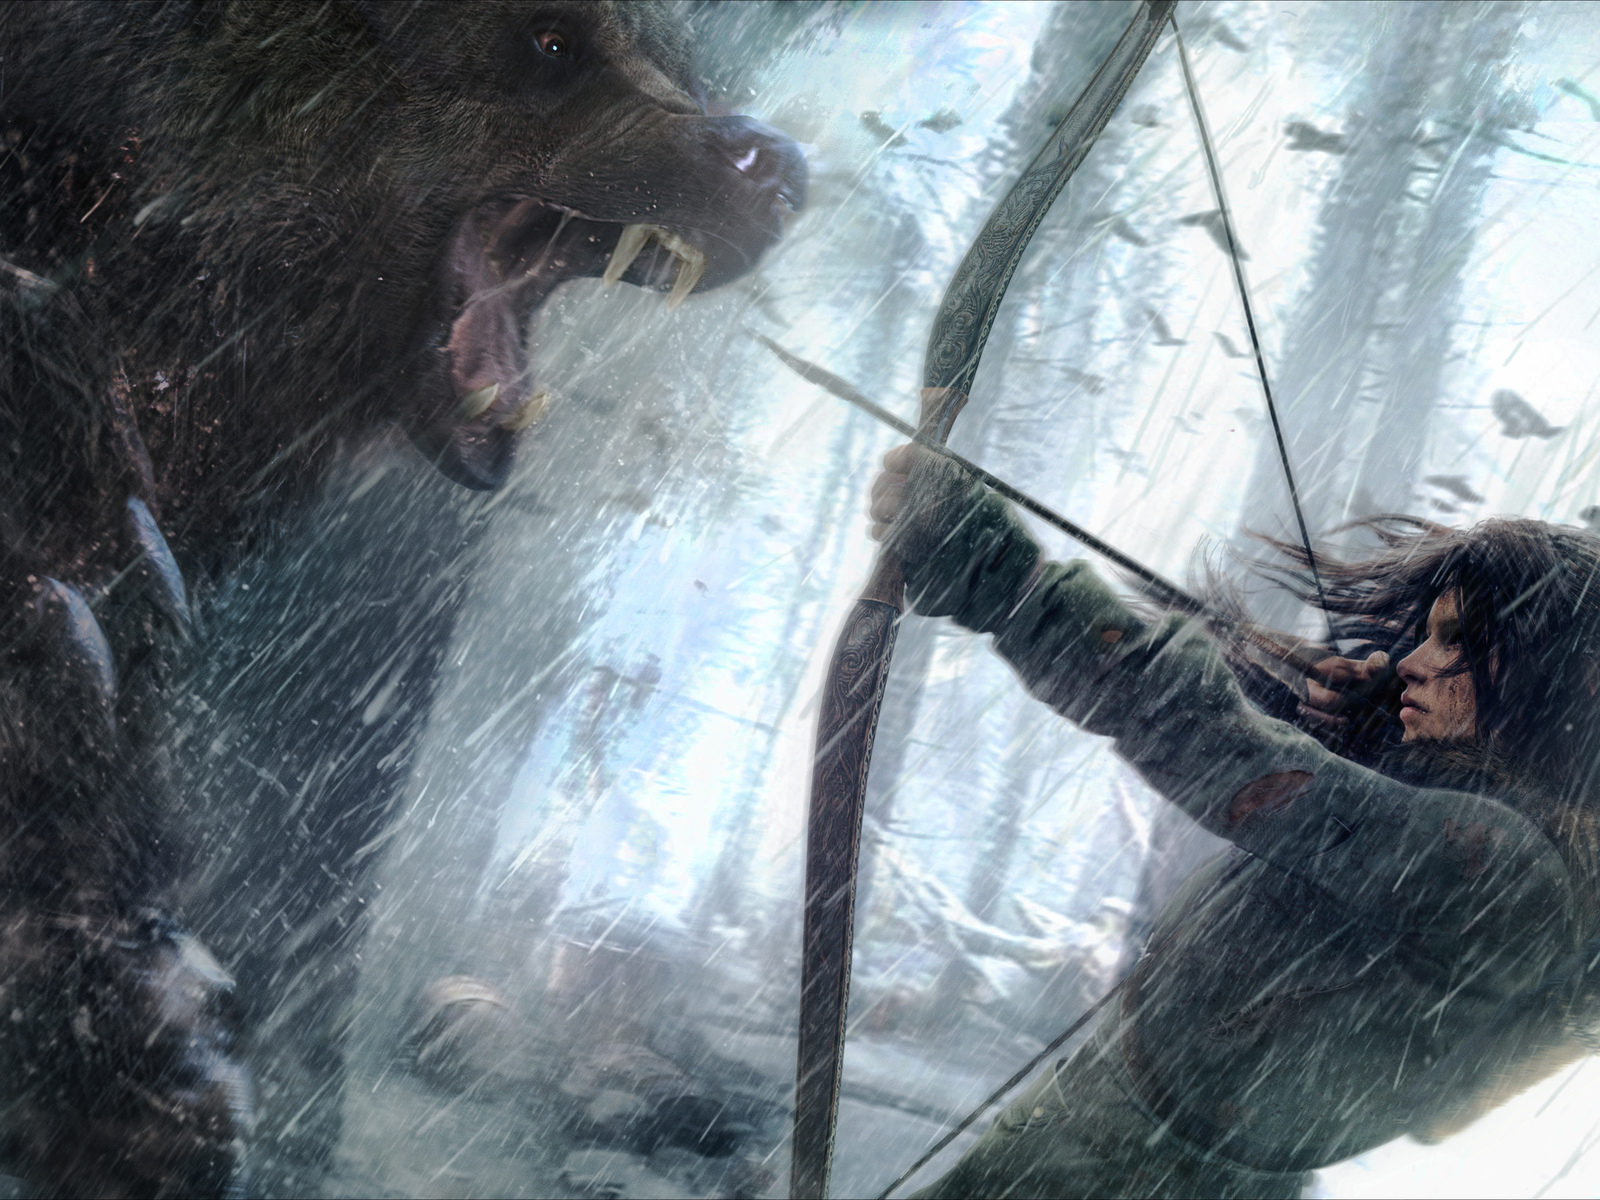 rise of the tomb raider, lara croft, tomb raider, ��������������� �������, �������, ���, ������������, ���������, �����, �����, ����